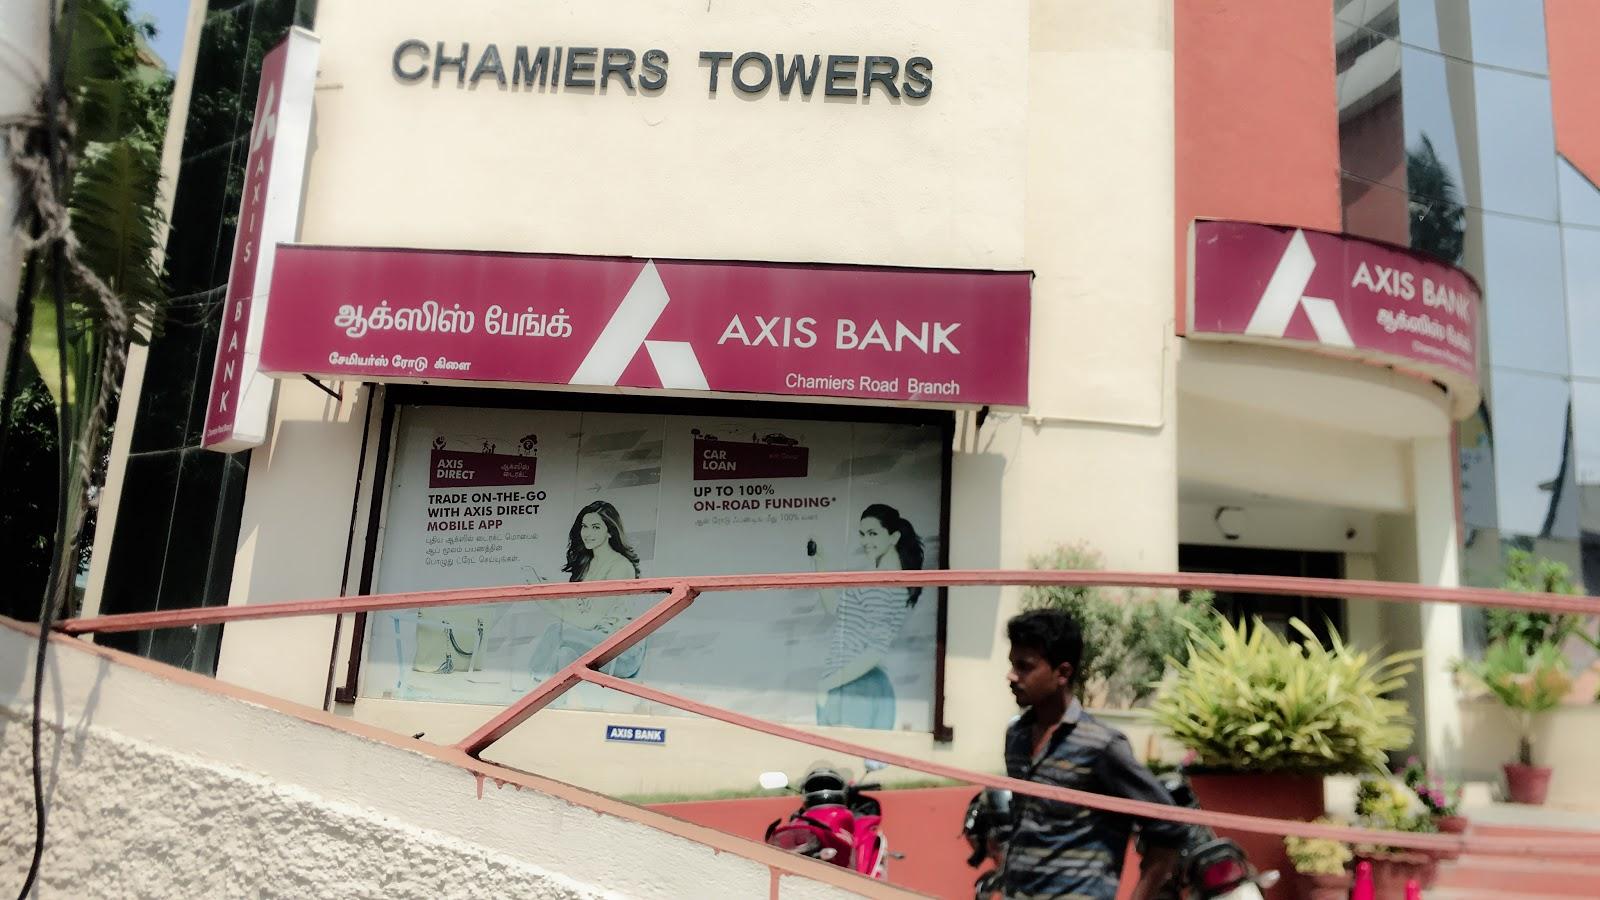 blood bank Axis Bank near Chennai Tamil Nadu